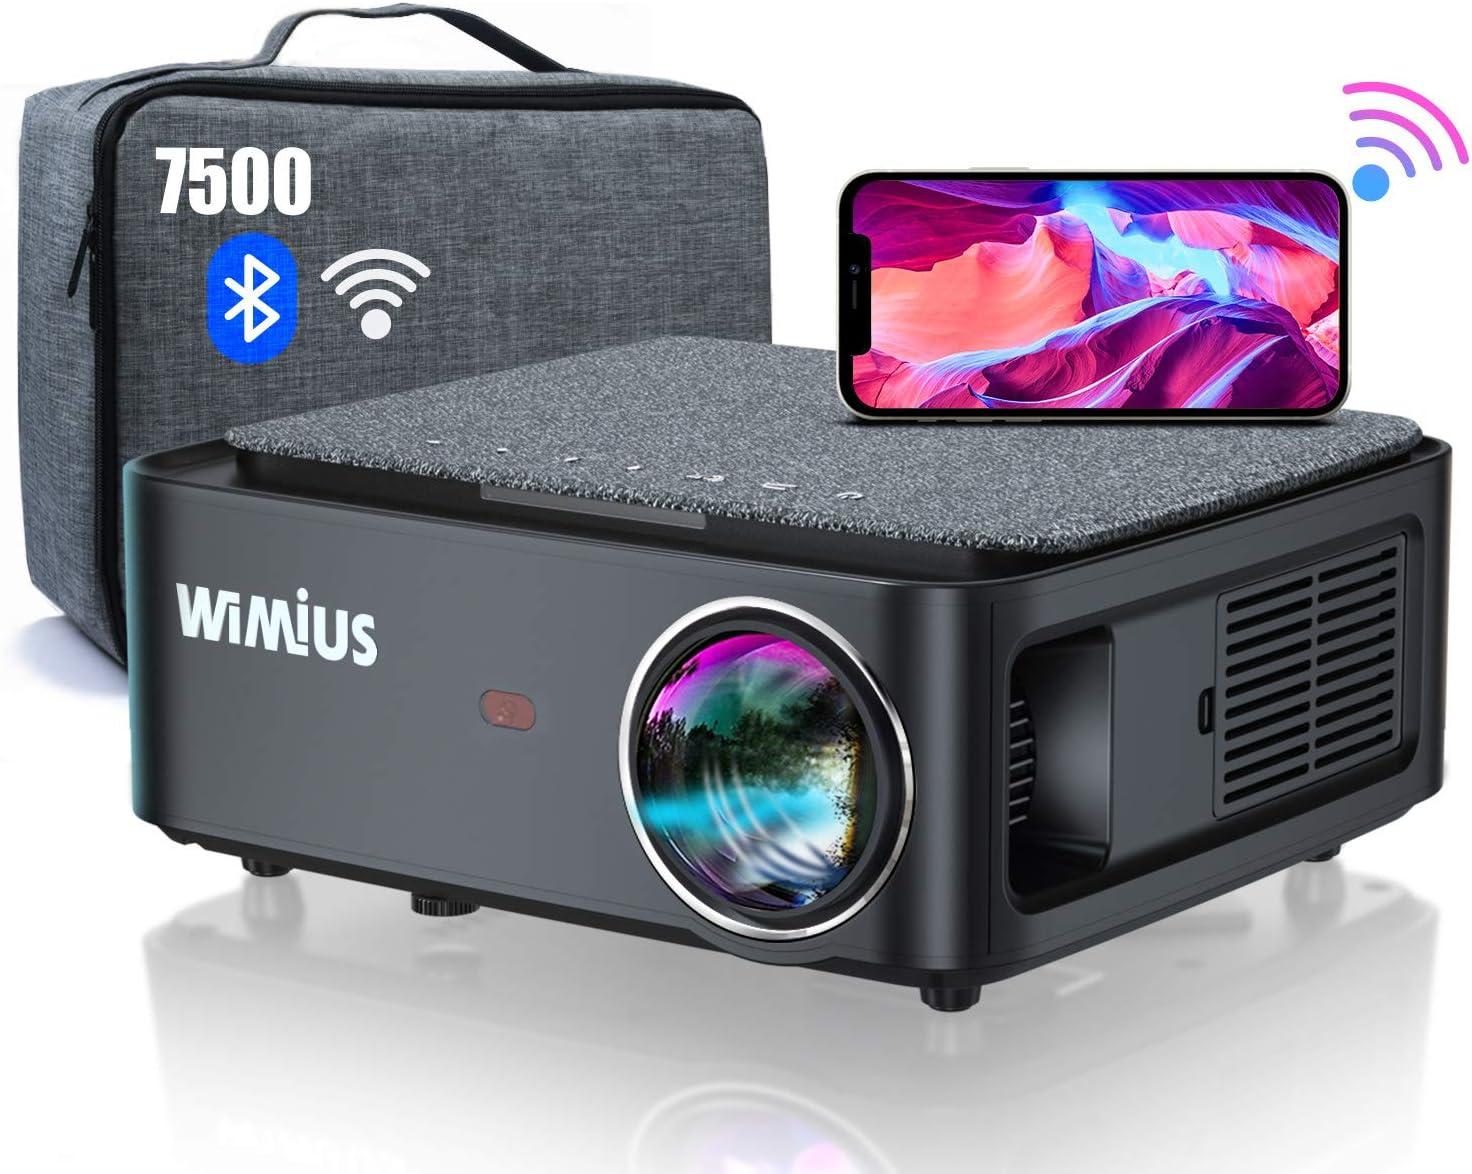 Proyector WiFi Bluetooth Full HD 1080P, 7500 WiMiUS Proyector WiFi 1080P Nativo Soporte 4K Ajuste Digital 4D Función de Zoom Proyector WiFi Cine en Casa para PPT,PS4,etc.